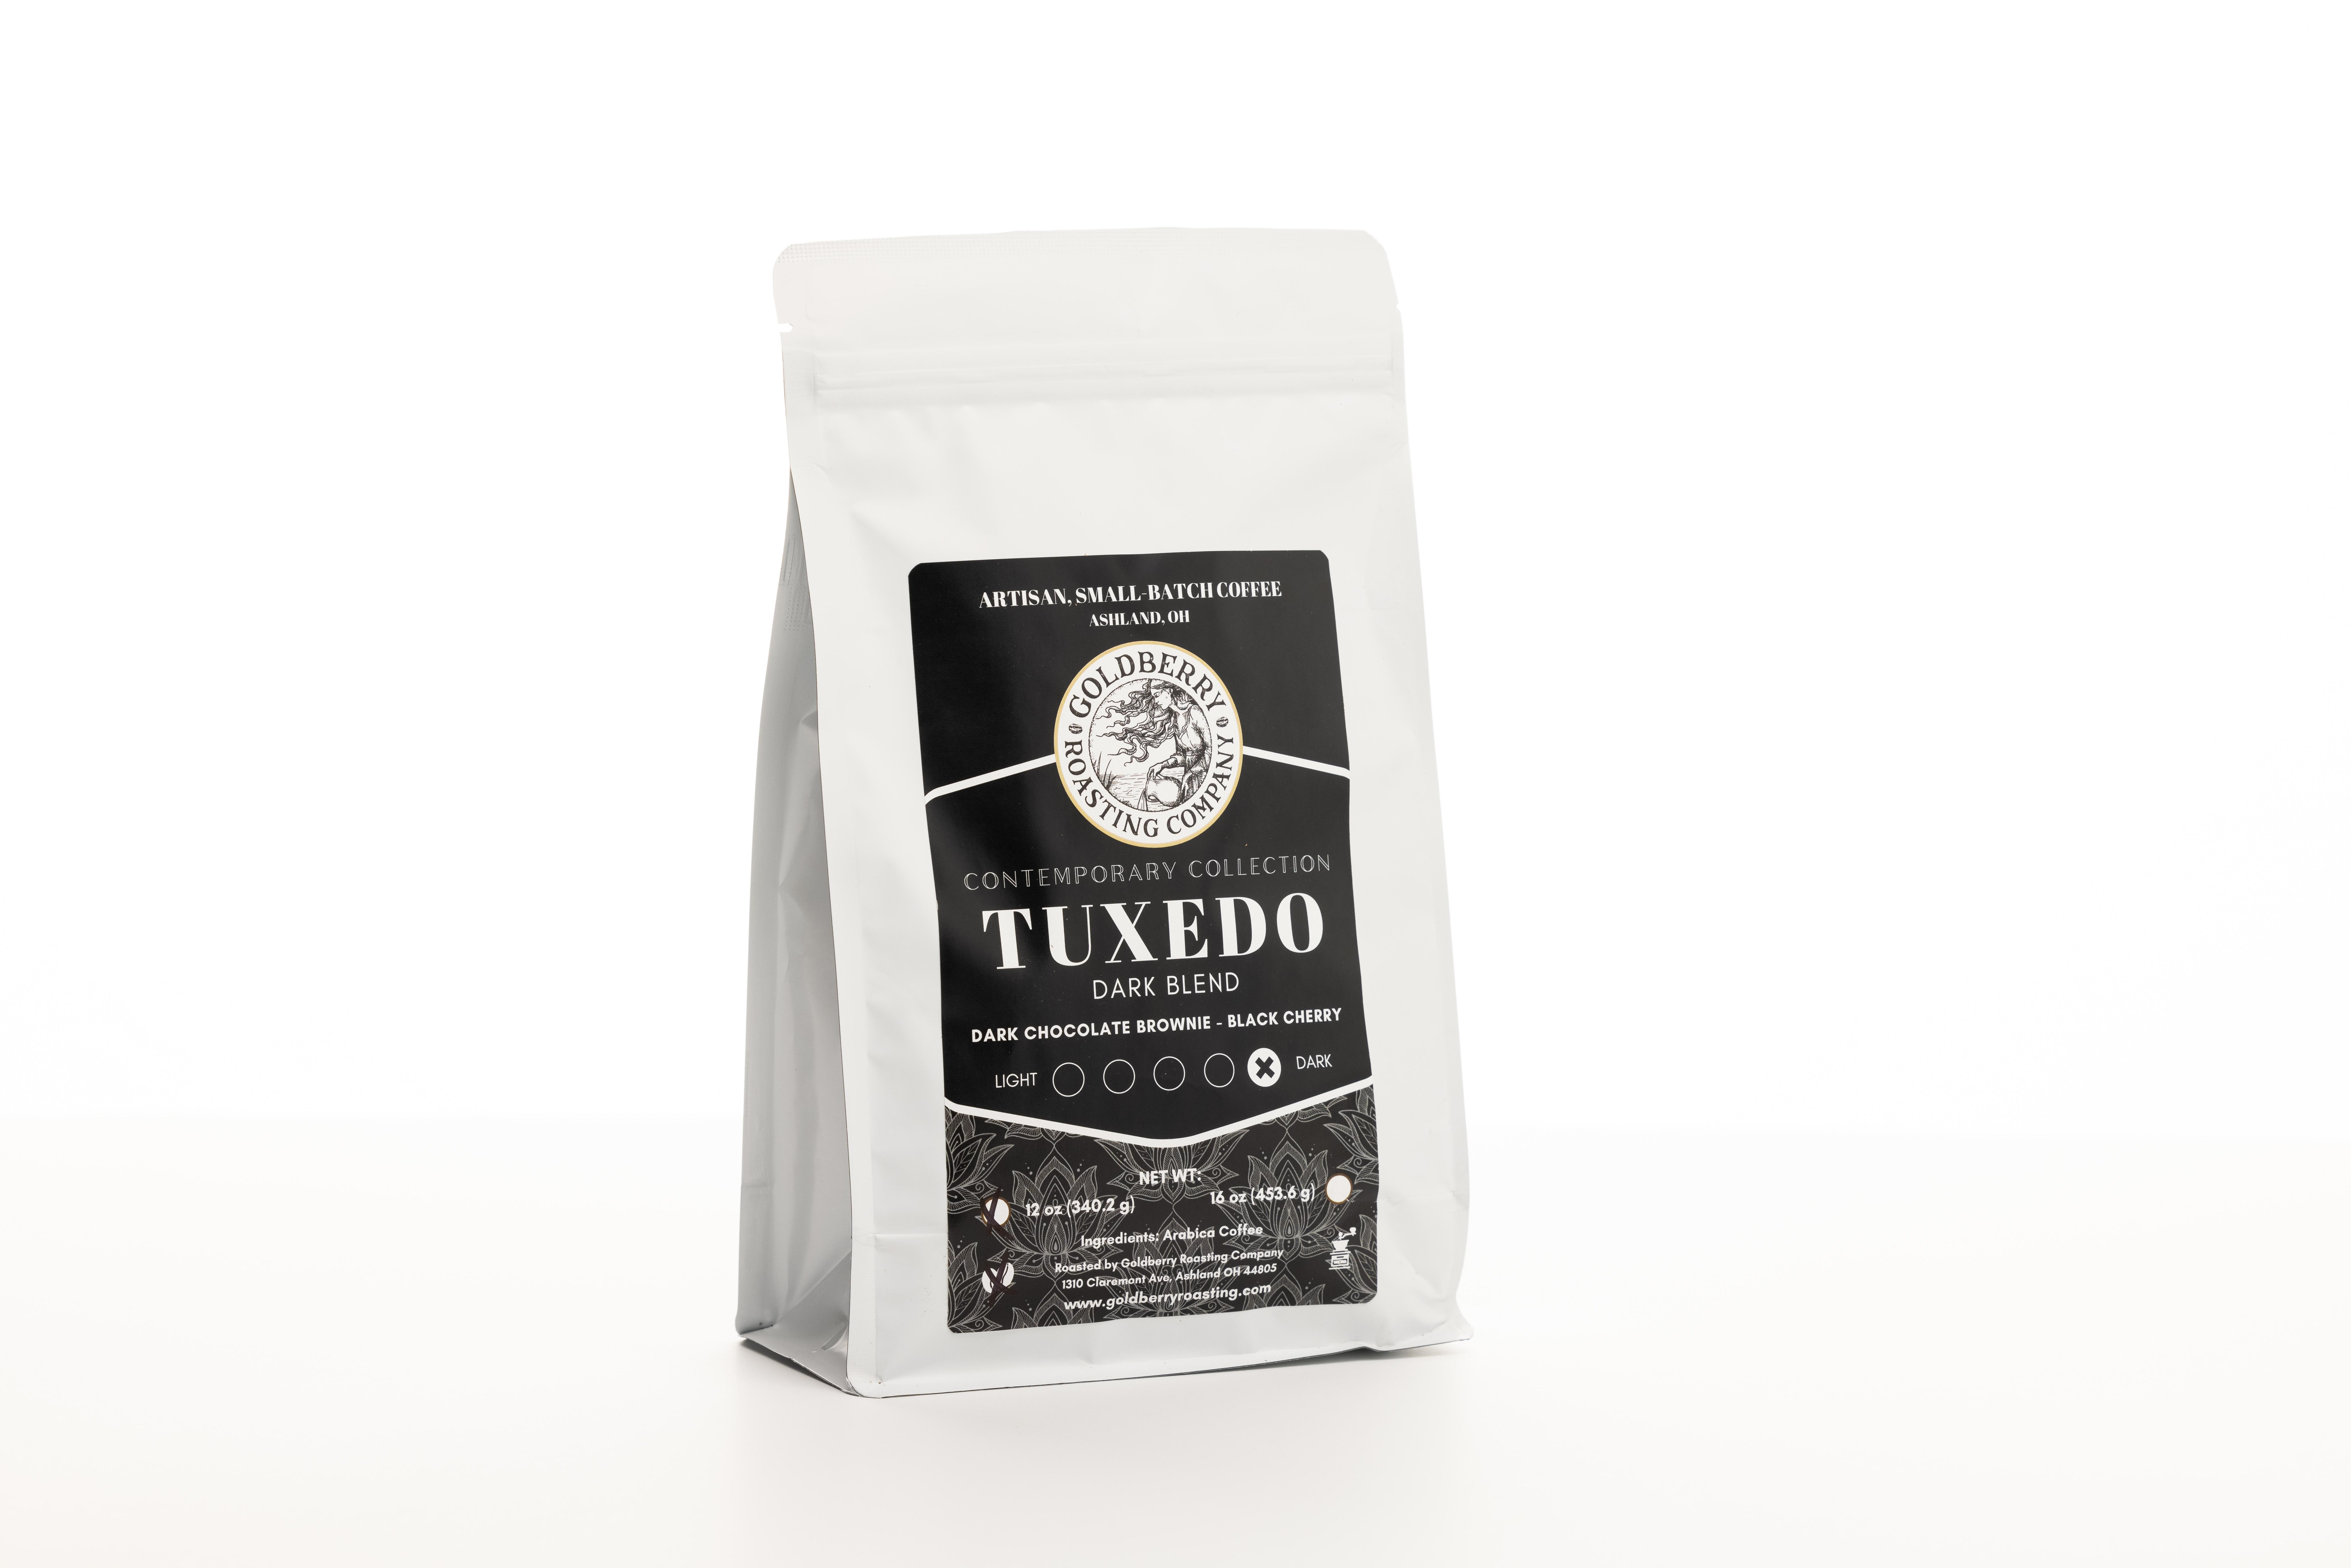 Tuxedo Dark Roast coffee from Goldberry Roasting Company.